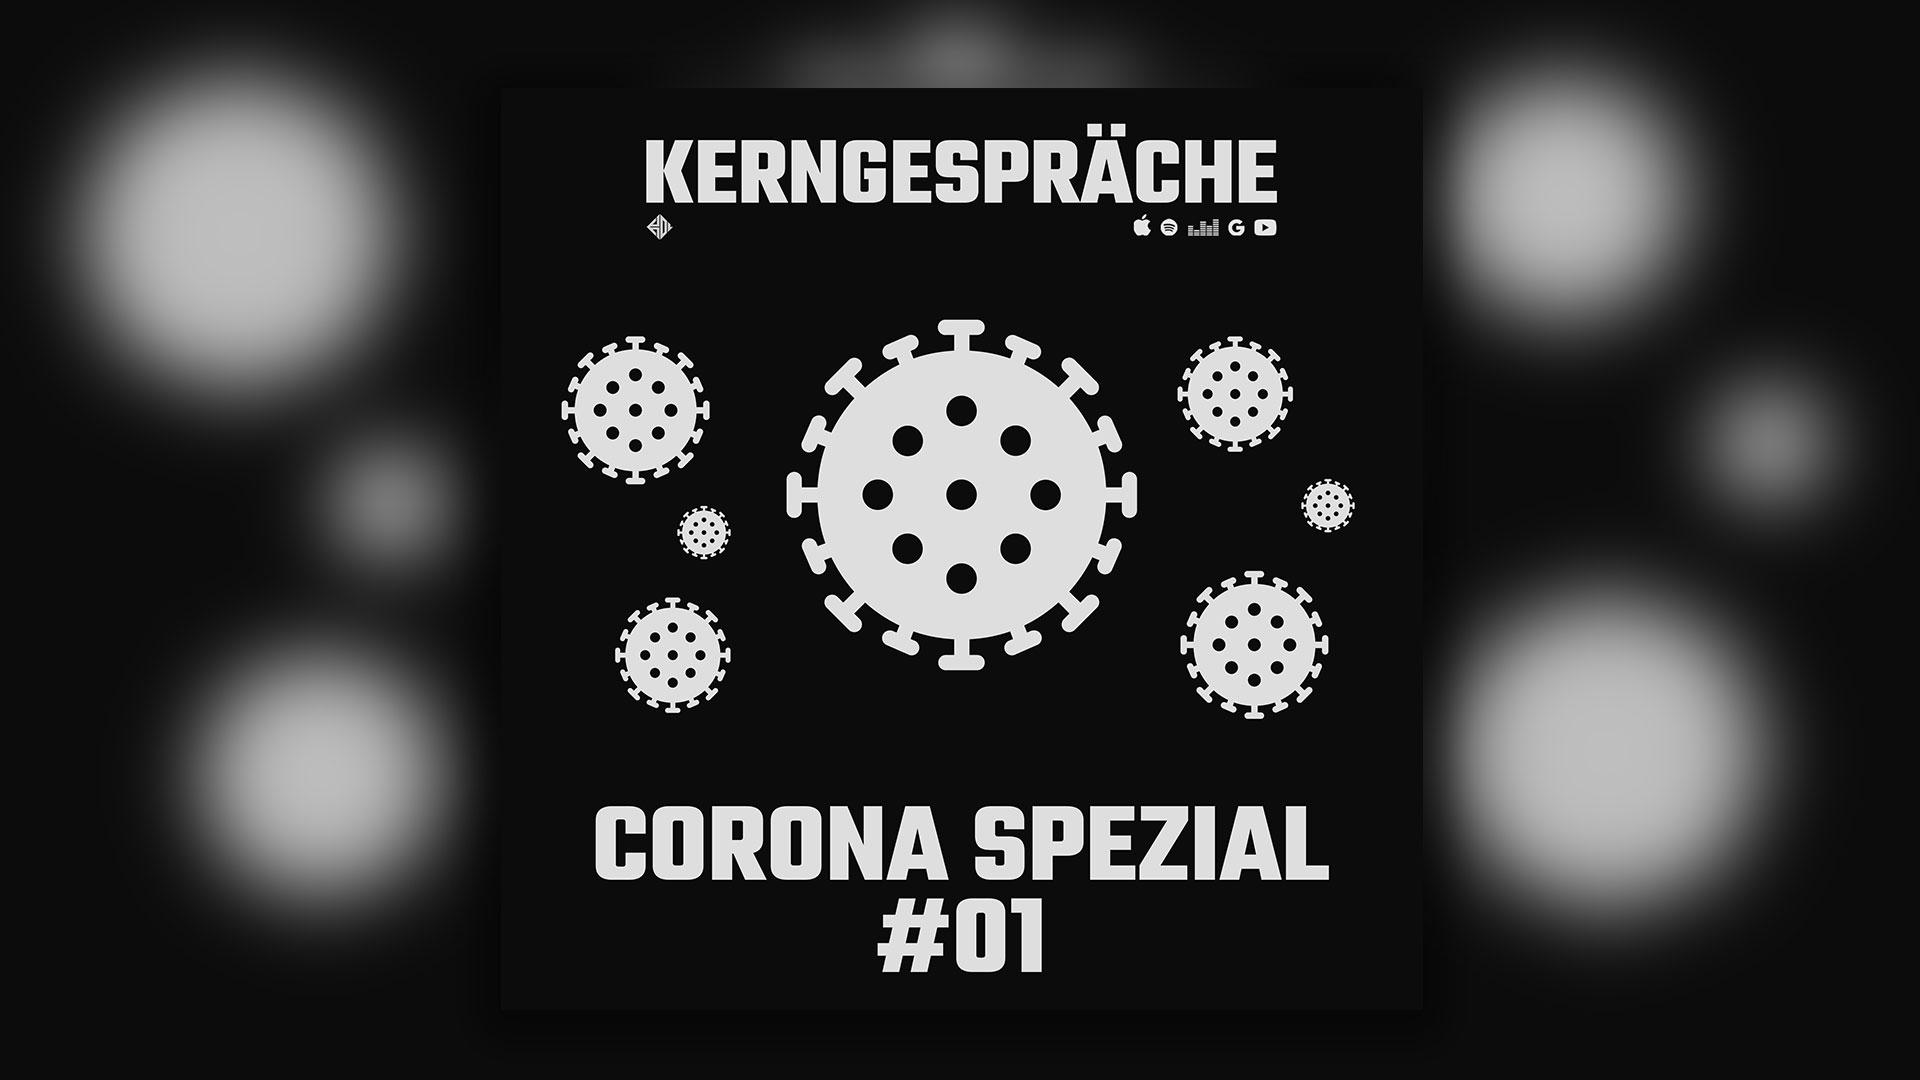 Corona COVID-19: Kerngespräche Spezial #01